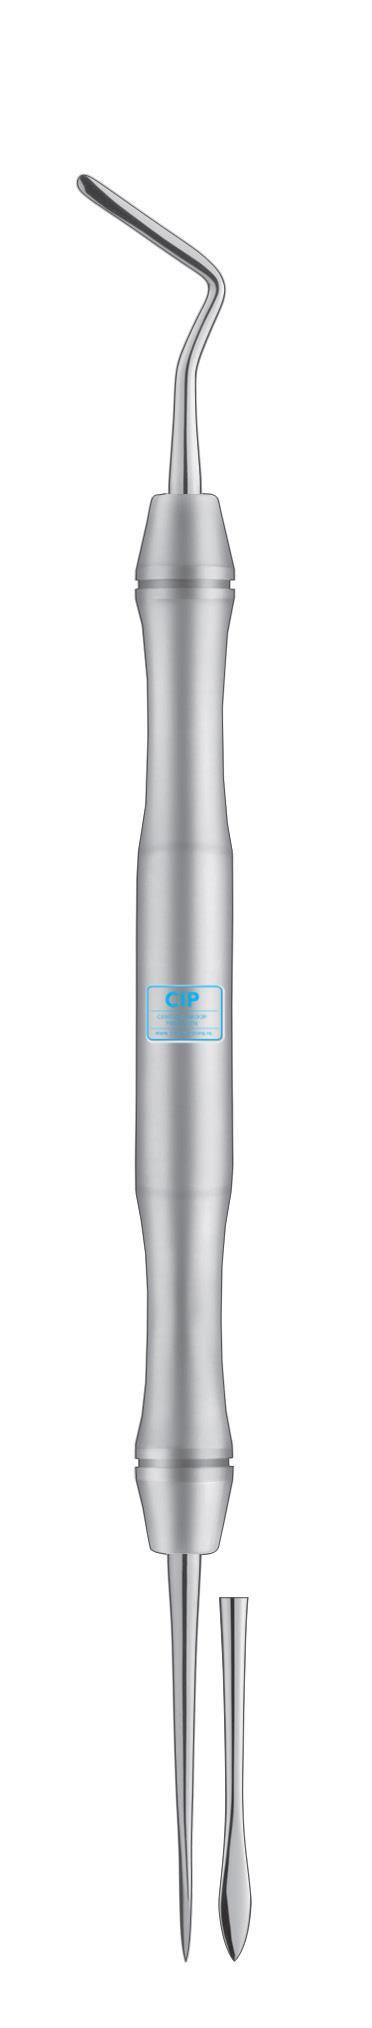 CARL MARTIN PERIOTOM ANTERIOR 1,4-2,0mm LIQUID STEEL NR.LS1806PT2